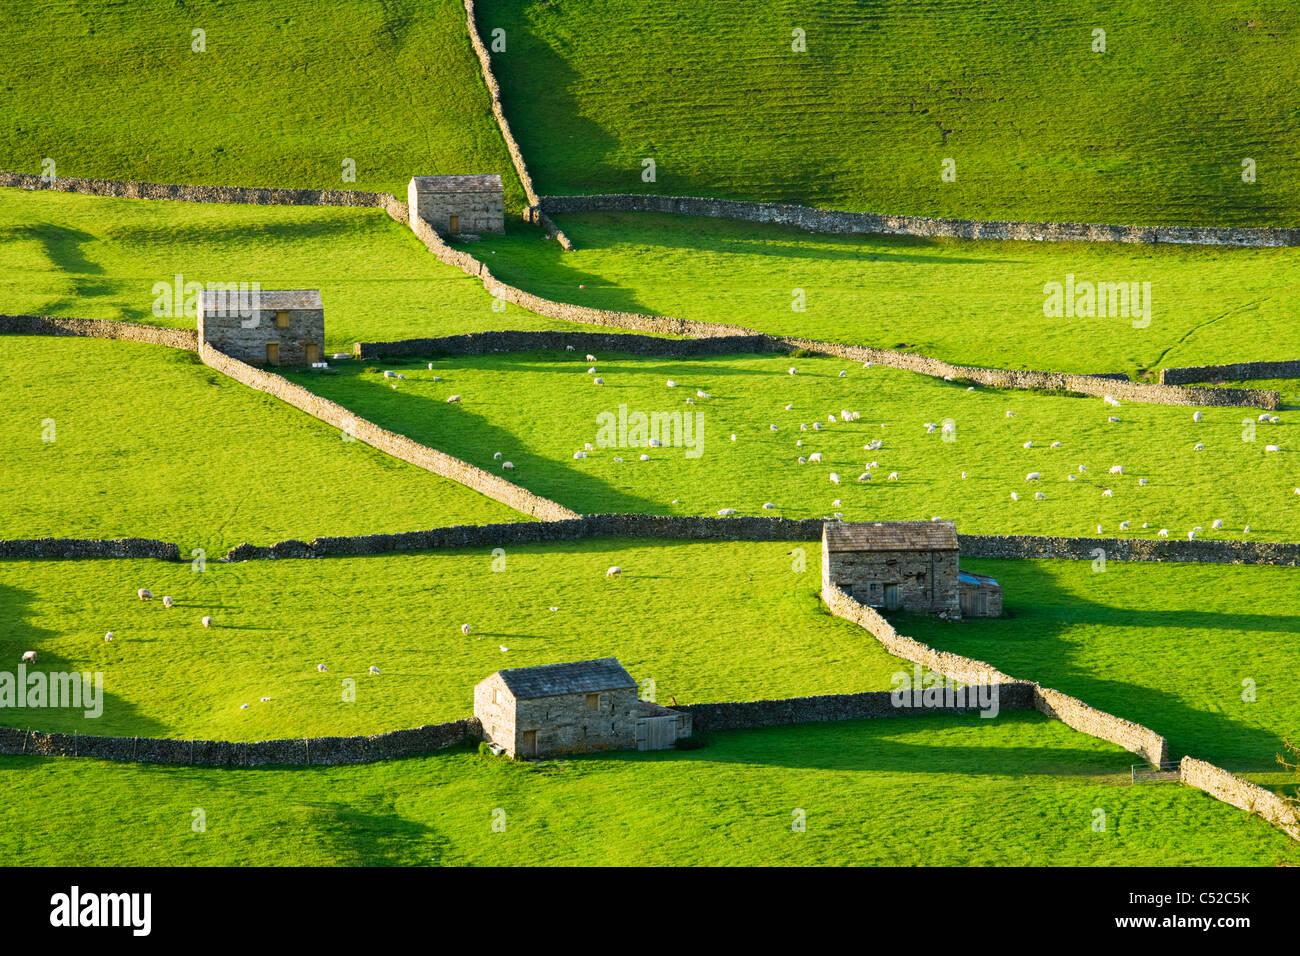 Gunnerside, Swaledale, Yorkshire Dales National Park, UK - Stock Image